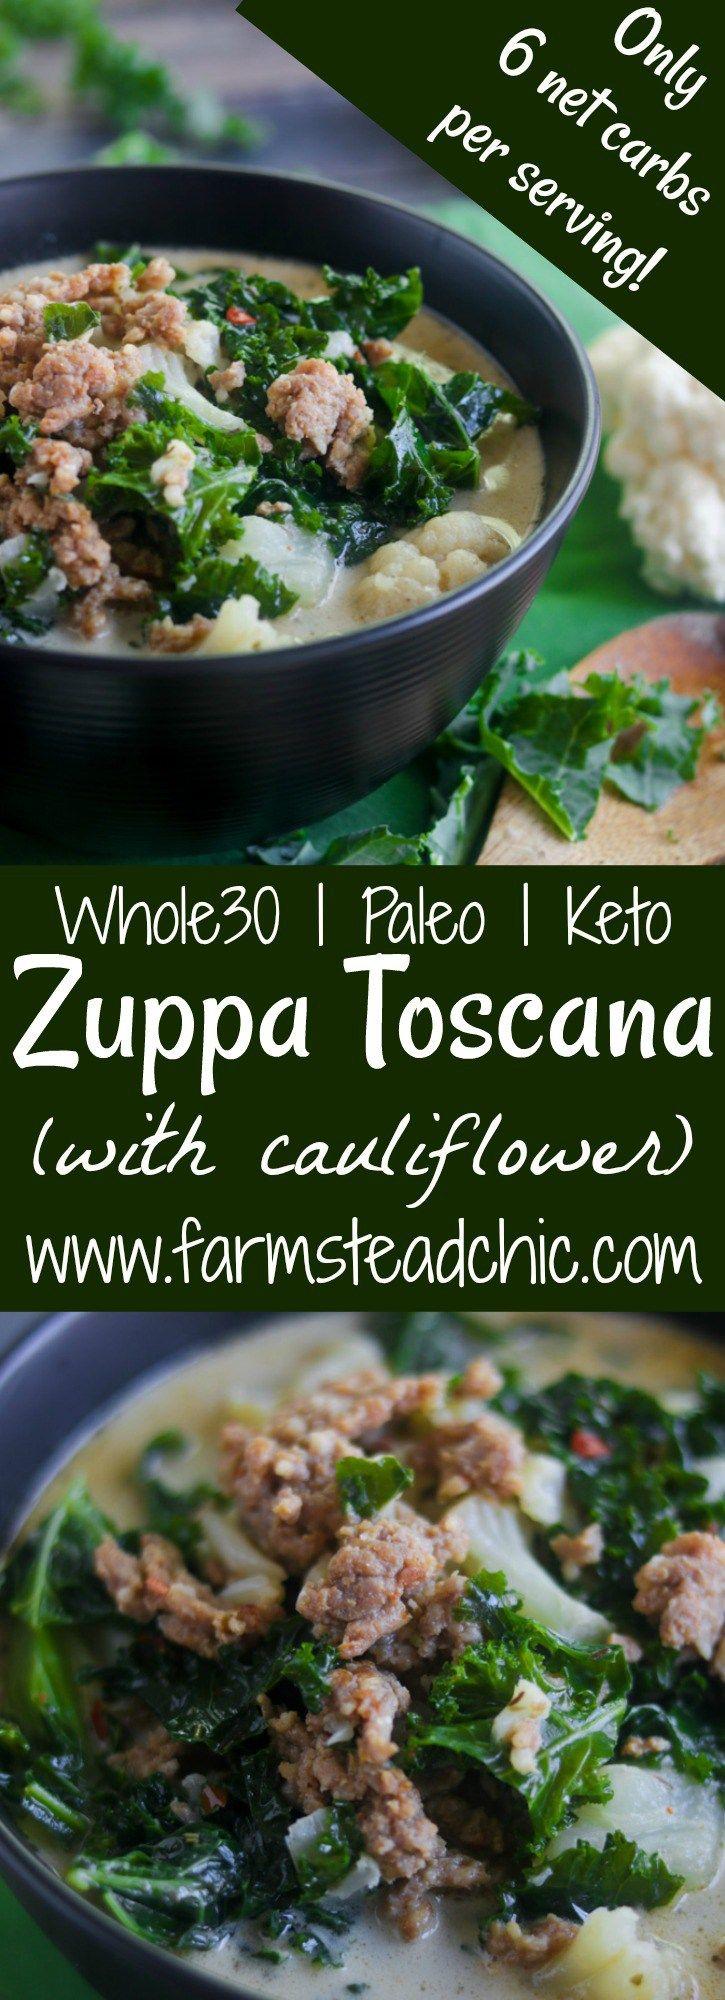 Low Carb, Keto Zuppa Toscana with Cauliflower (Paleo and Whole30)